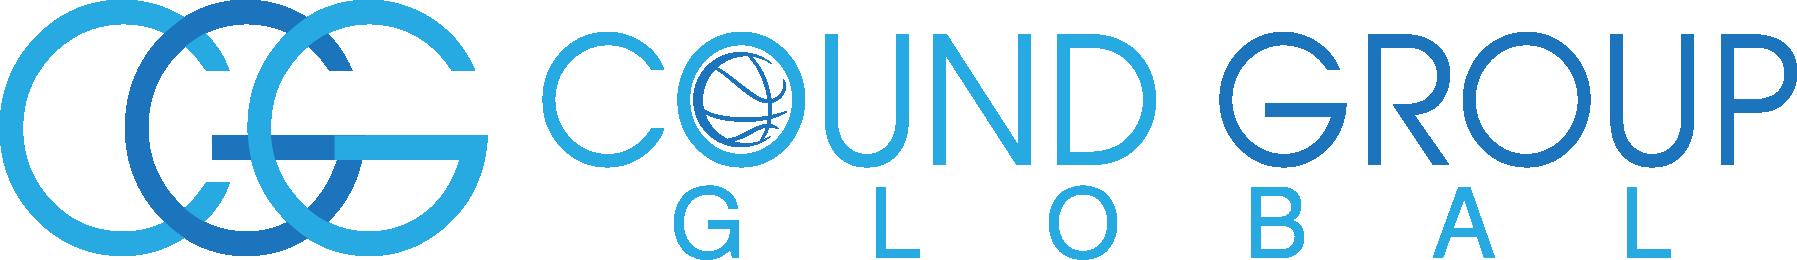 logo.coundgroupglobal